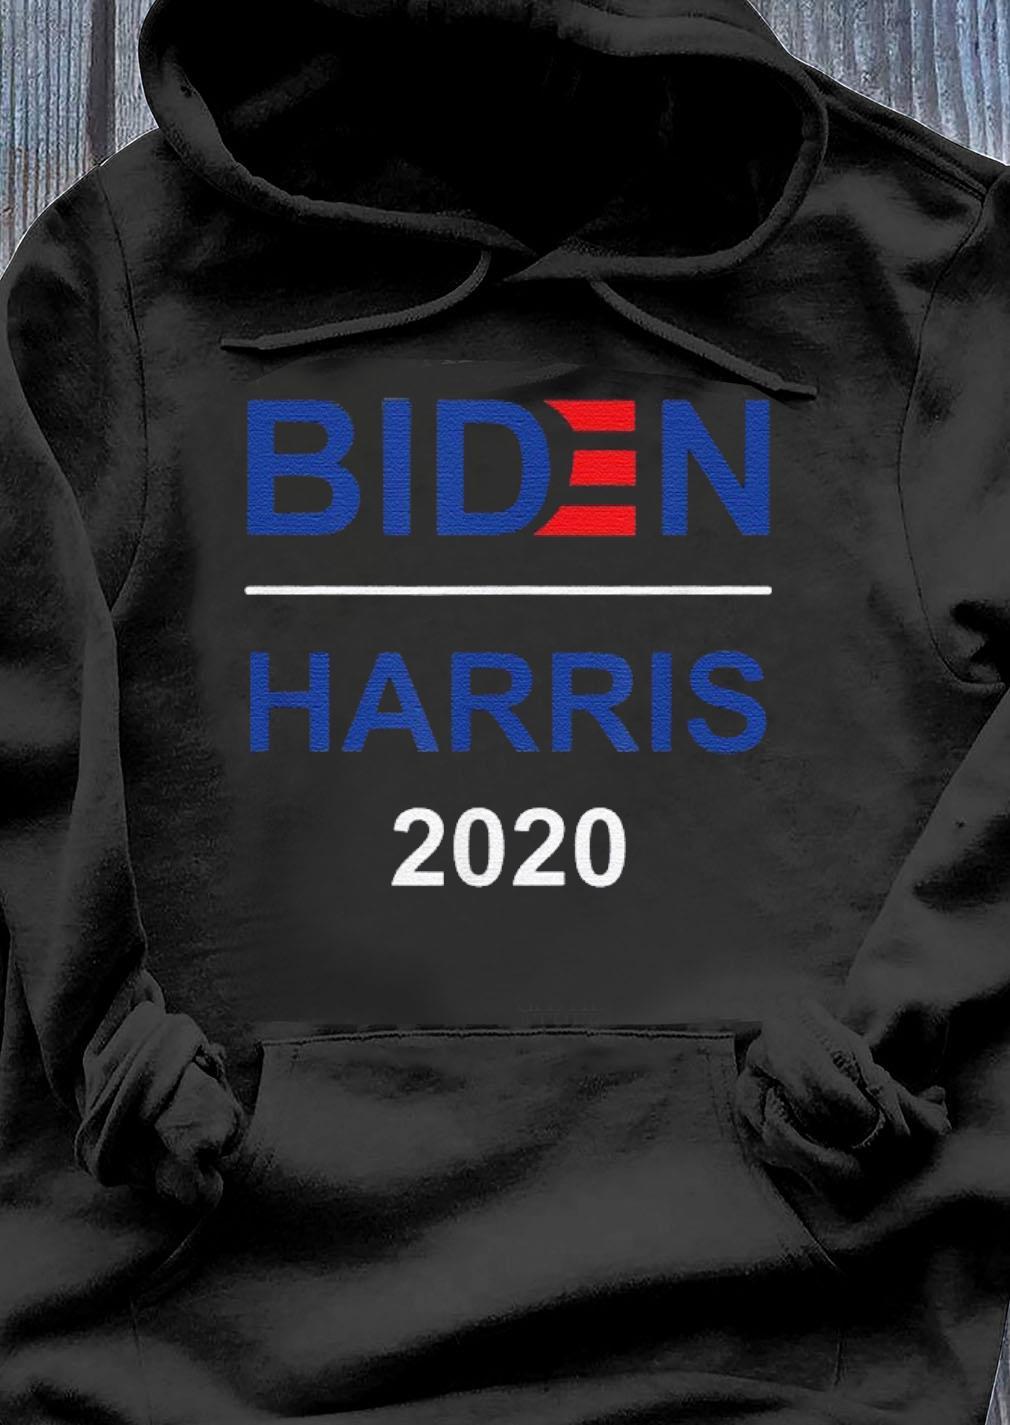 Biden Harris 2020 Elect The Biden Harris Team s Hoodie